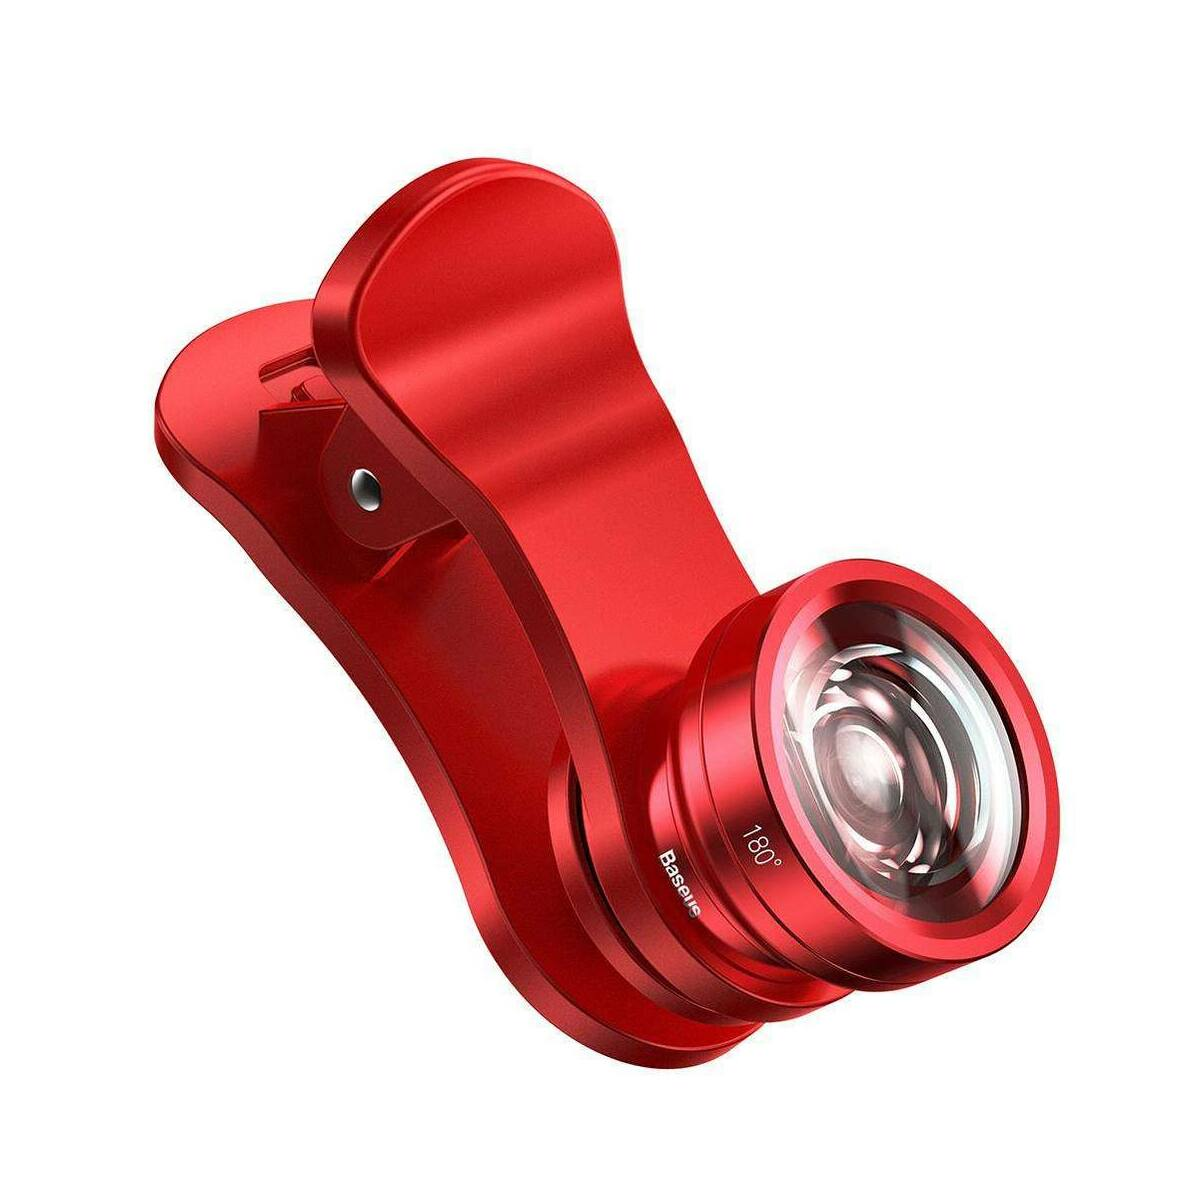 Baseus kamera optika mobilhoz Short Videos Magic (Professional), piros (ACSXT-B09)